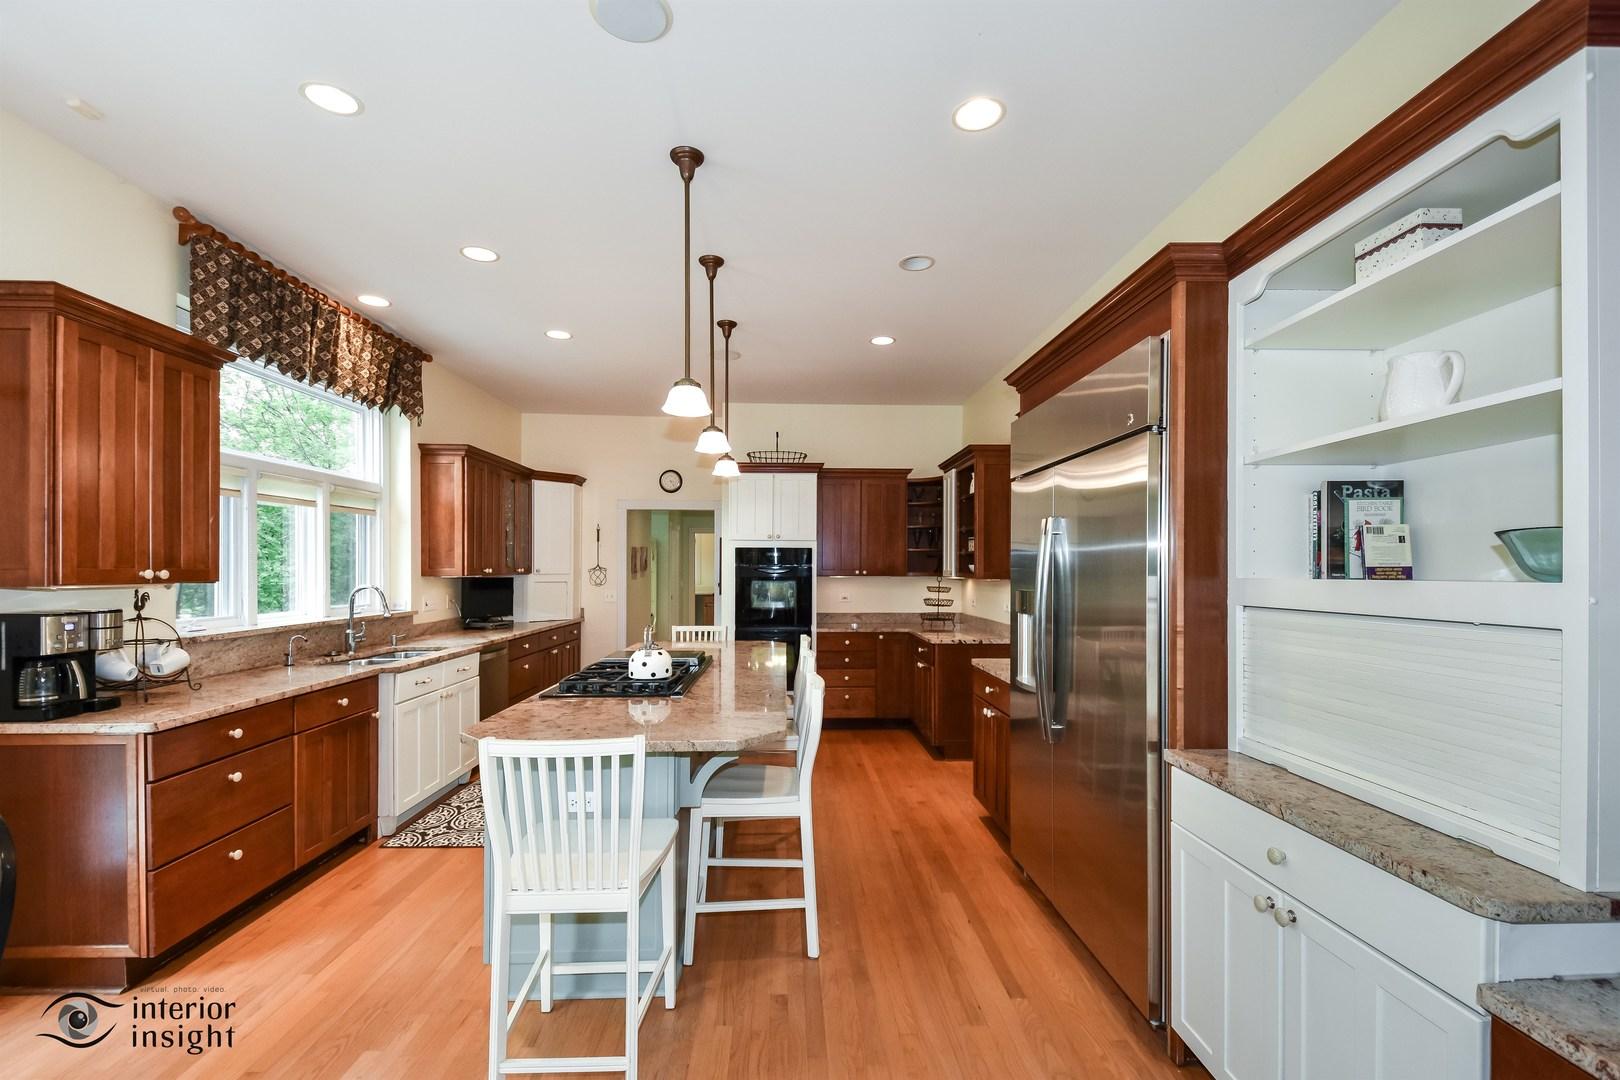 814 Becker, Glenview, Illinois, 60025